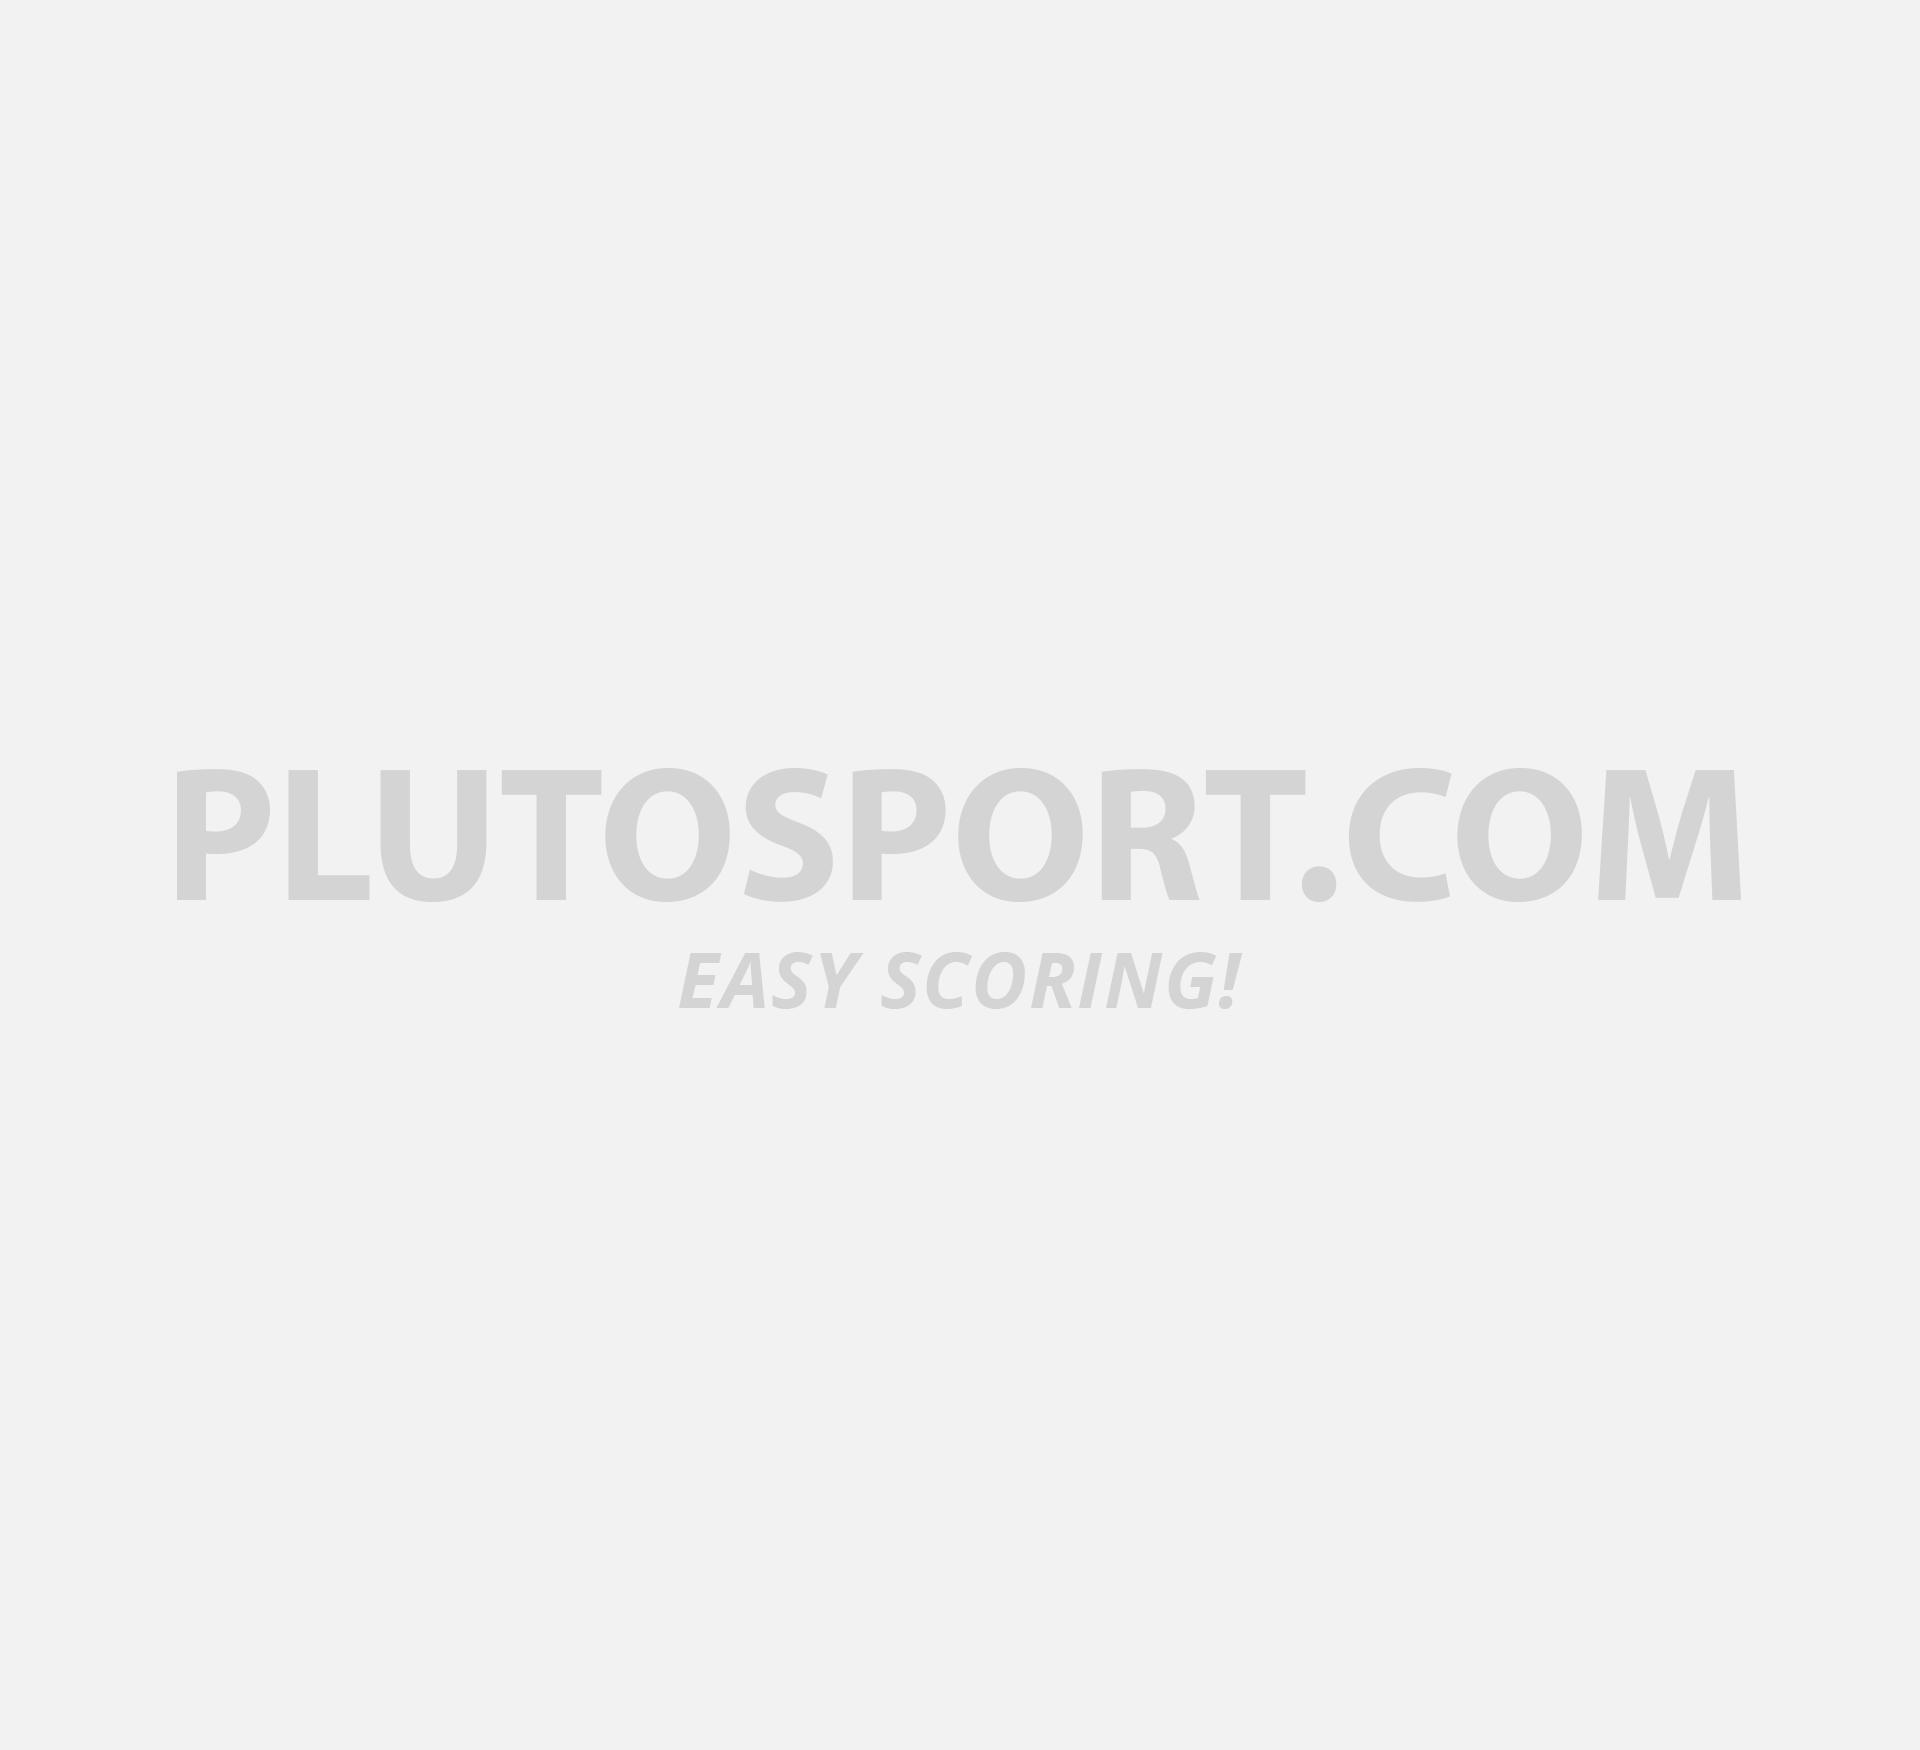 611a6784d2 Nike Pro Combat Knie Sportbandage 2.0 - Level 1 - Knee - Injury support -  Basketball - Women | Plutosport